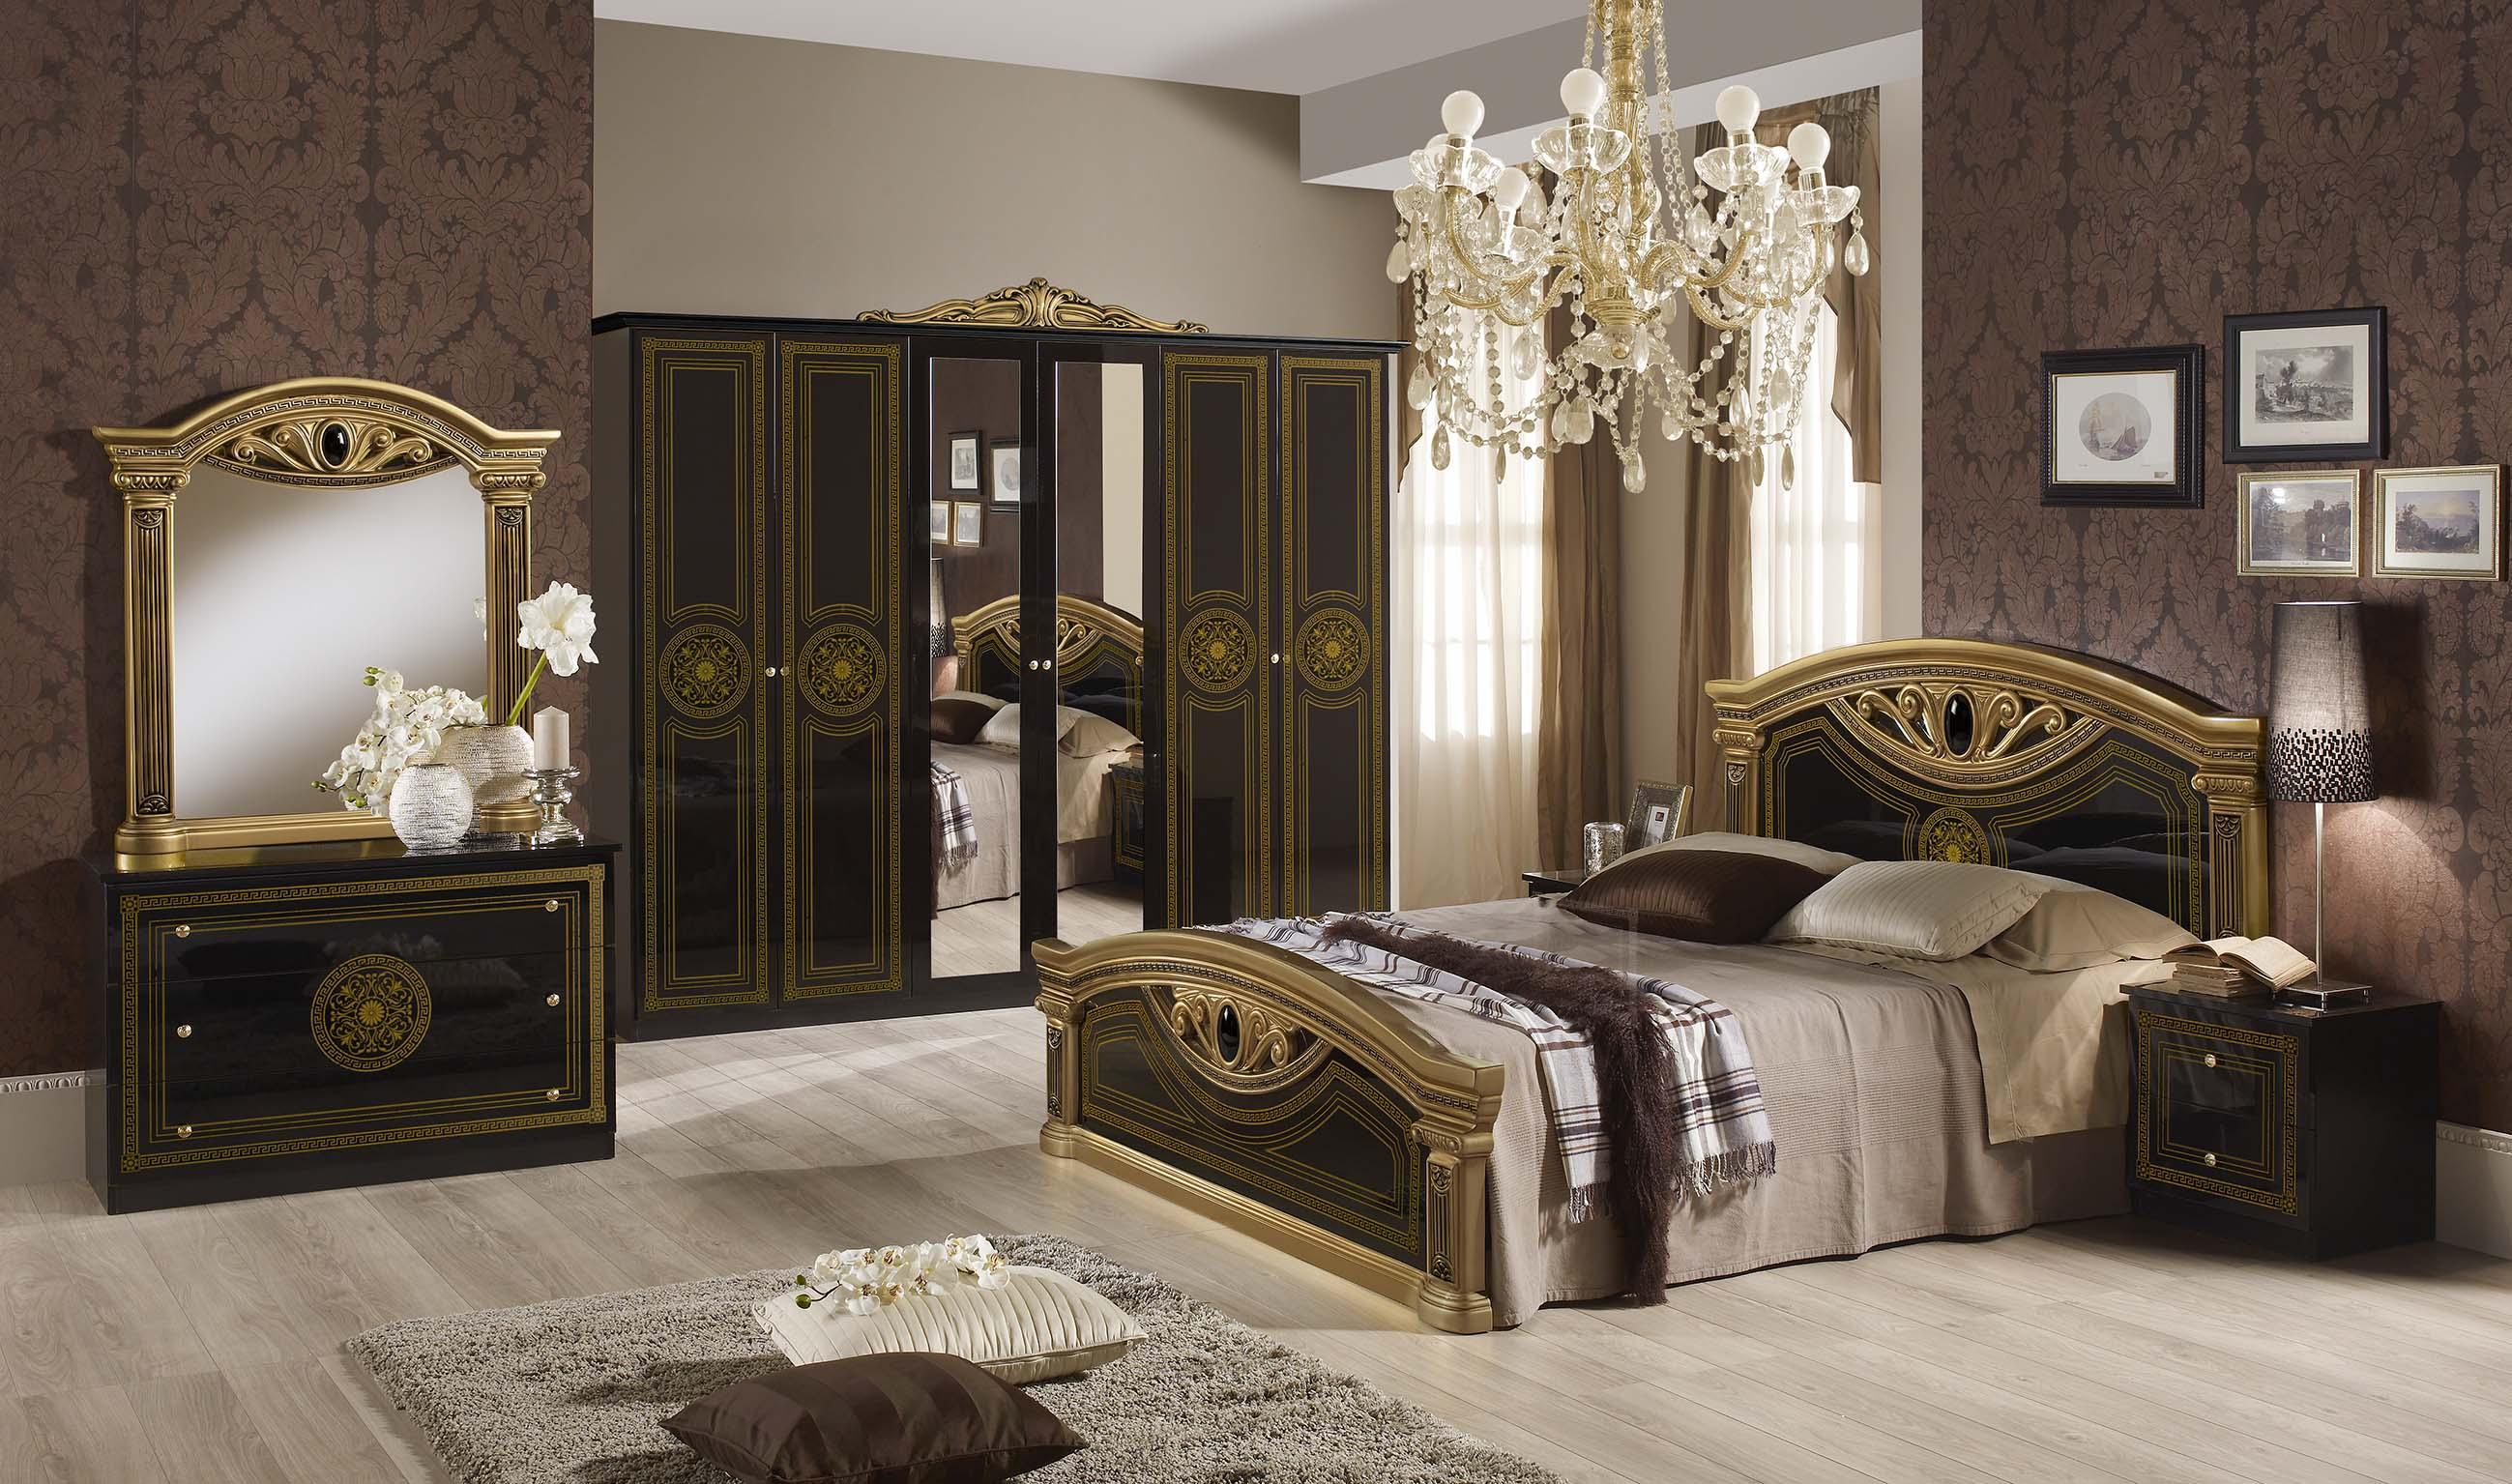 Schlafzimmer Giulia in schwarz silber Klassik Barock-XP_PFGLCCA4A